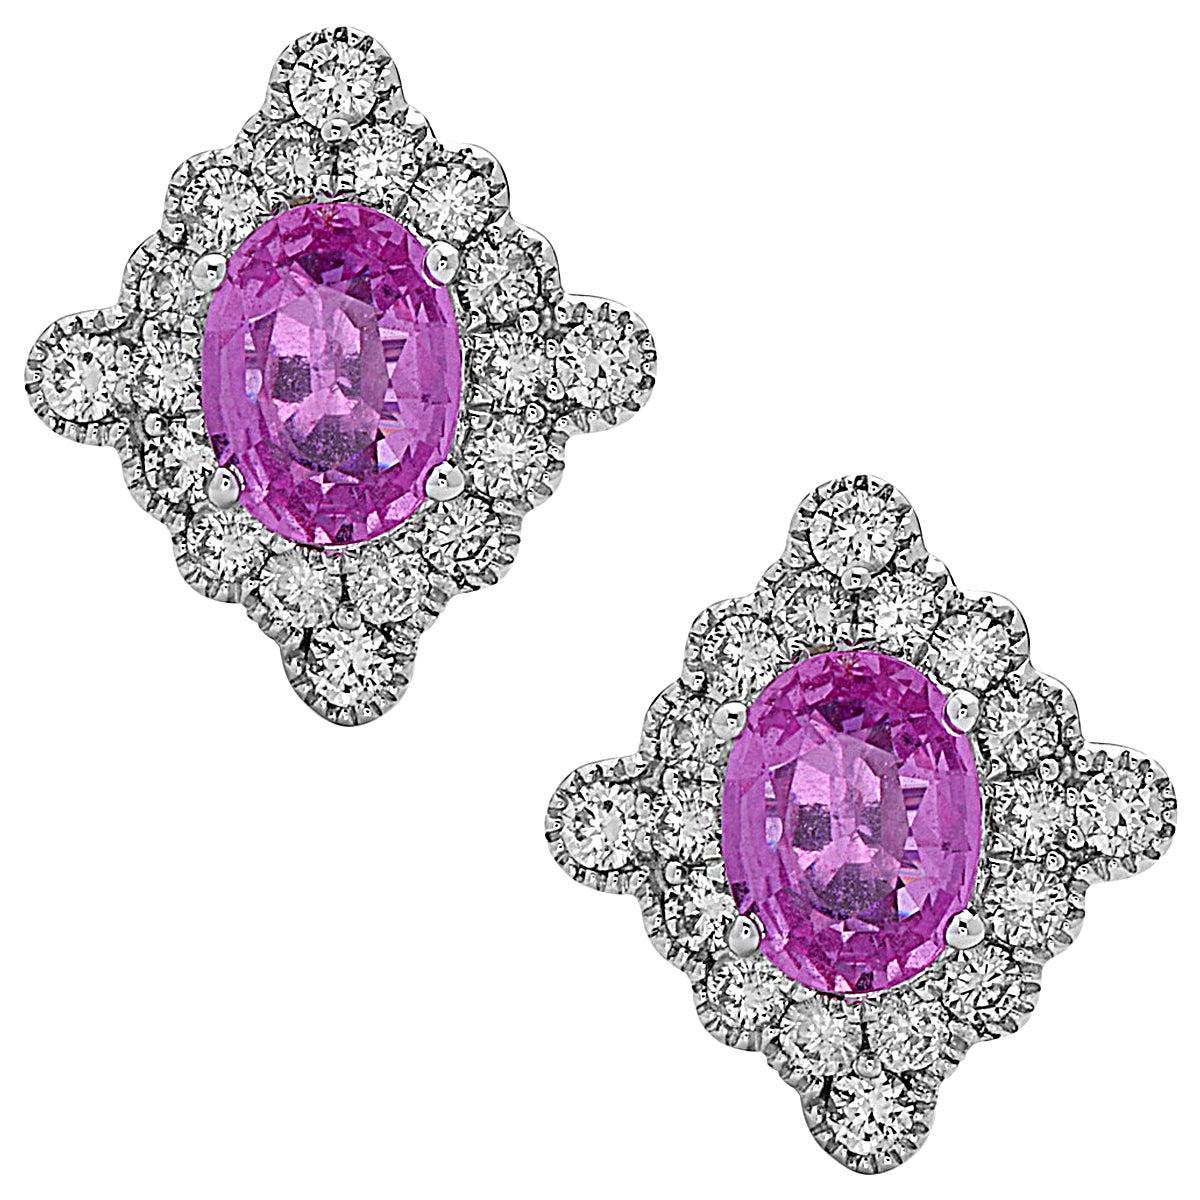 Stunning Pink Sapphire Diamond Gold Stud earrings